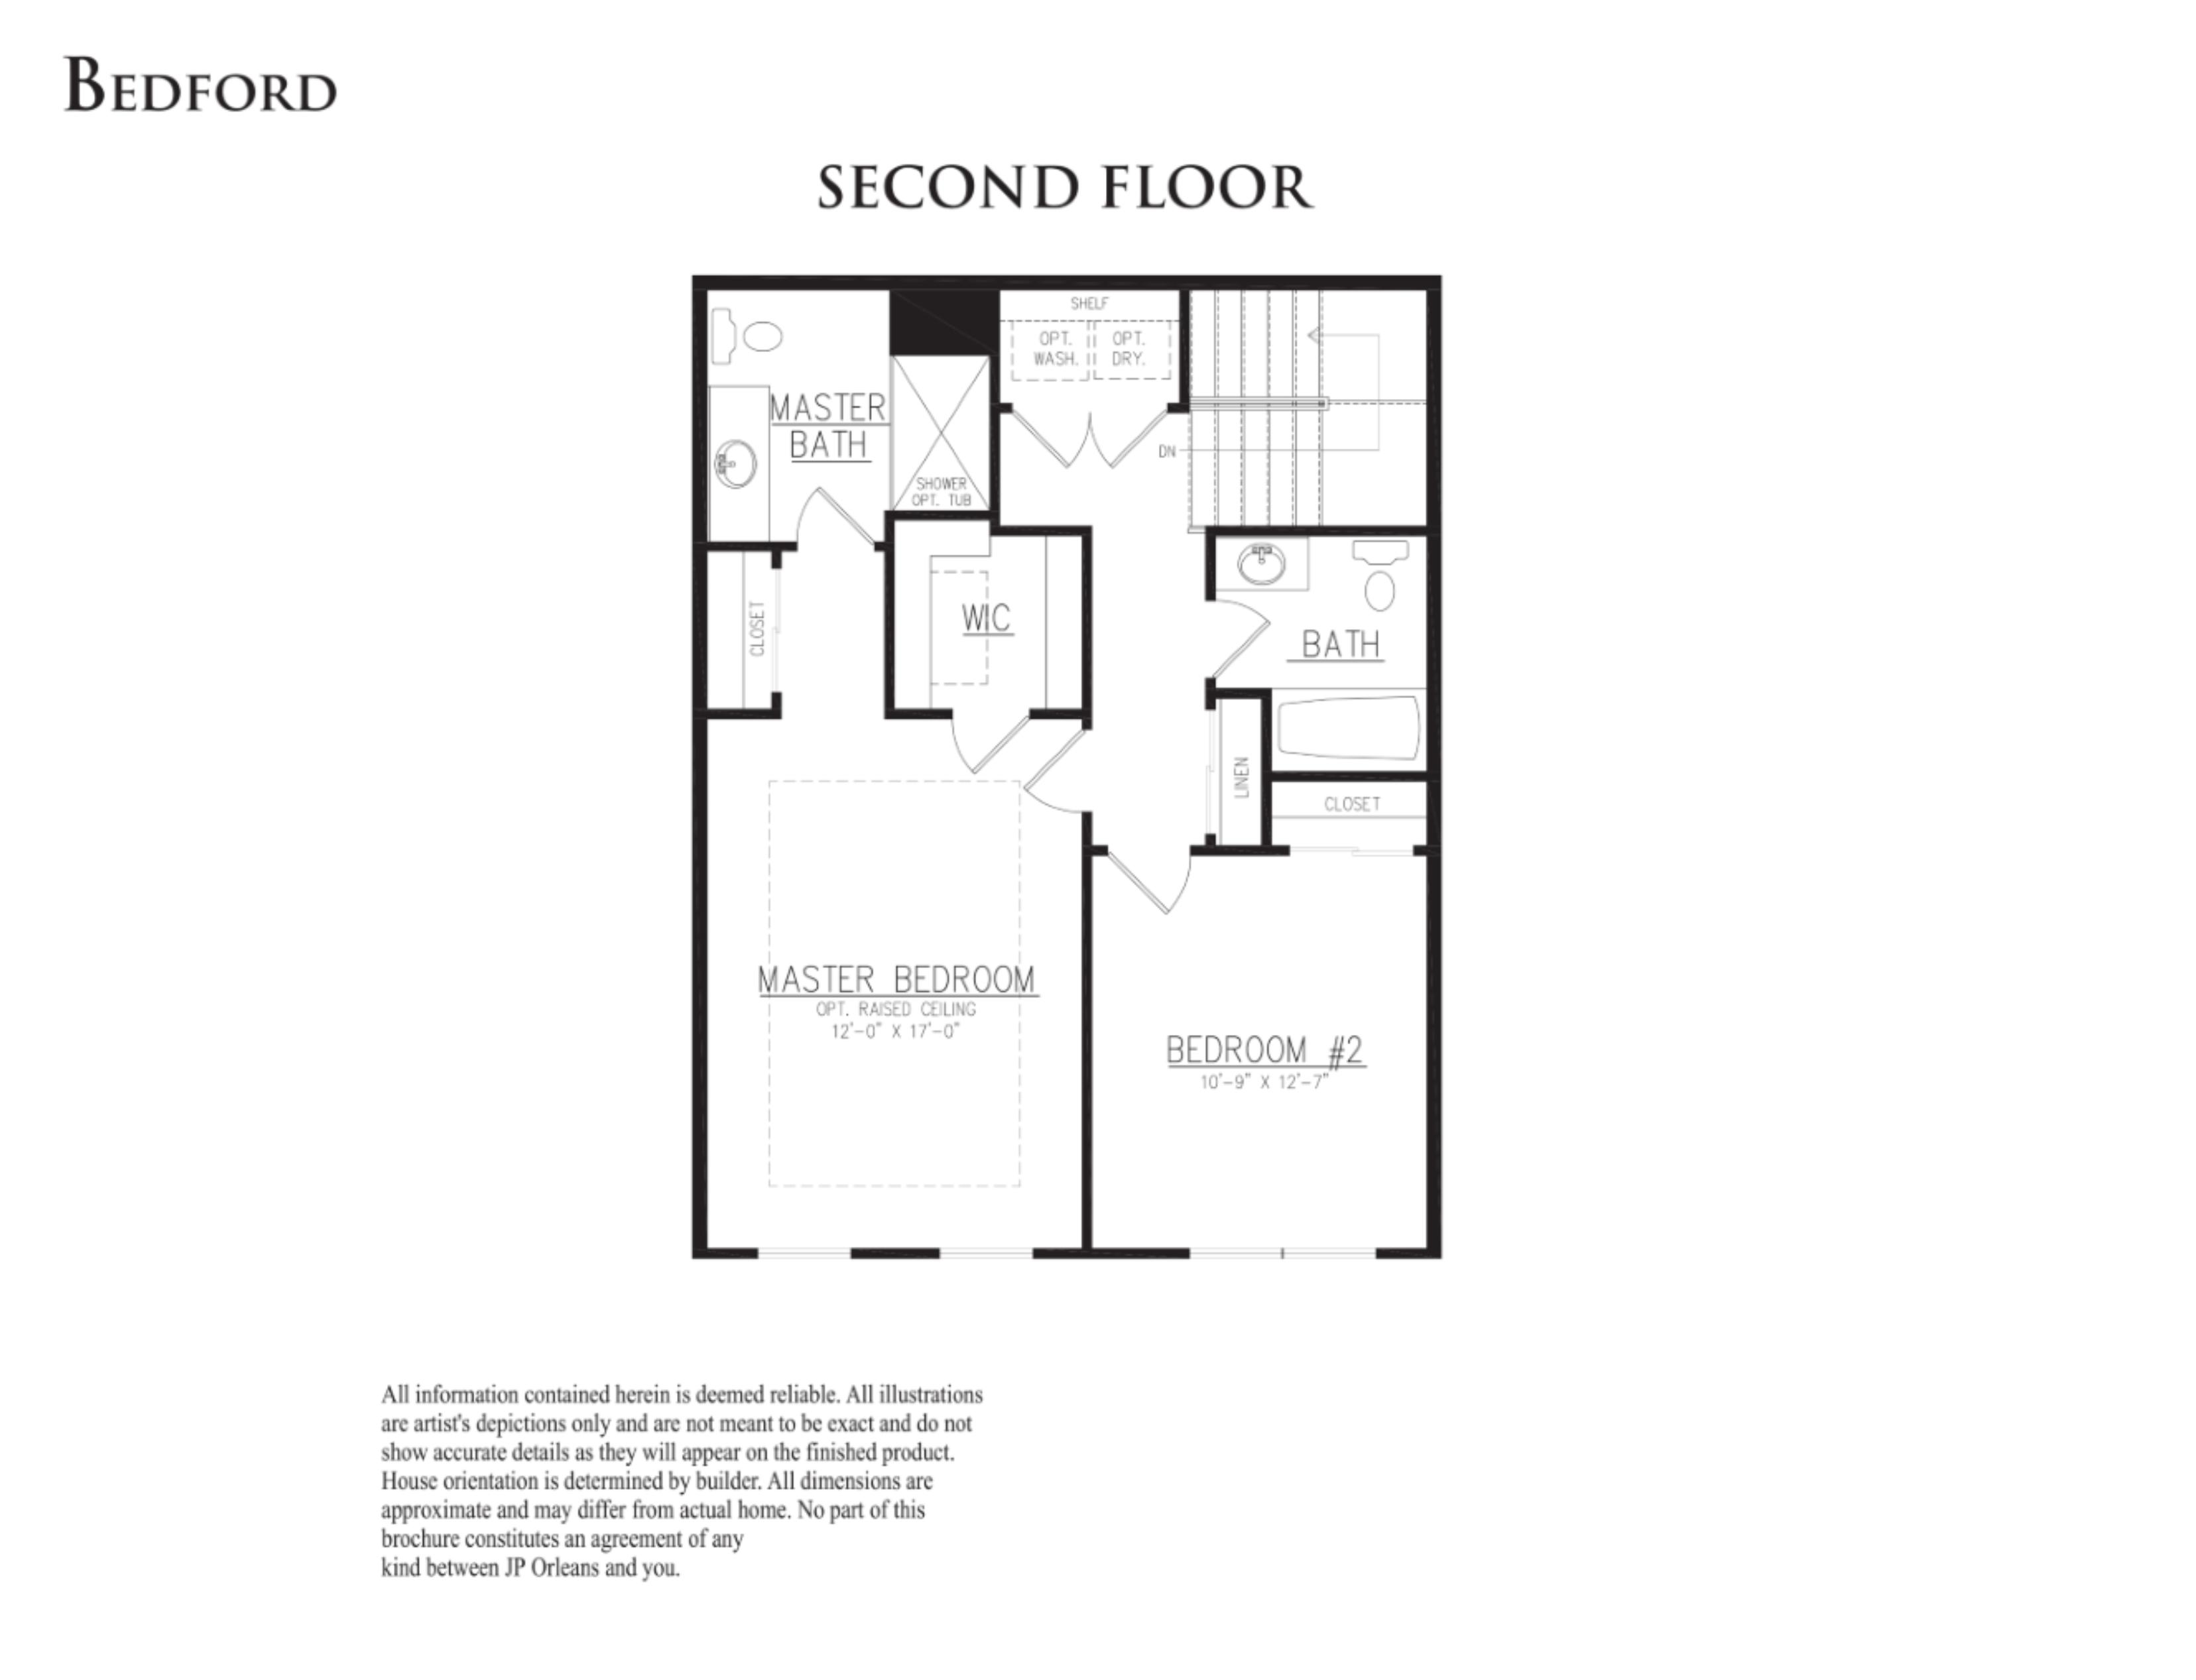 Lexington-Bedford-2nd-Floor-1.png